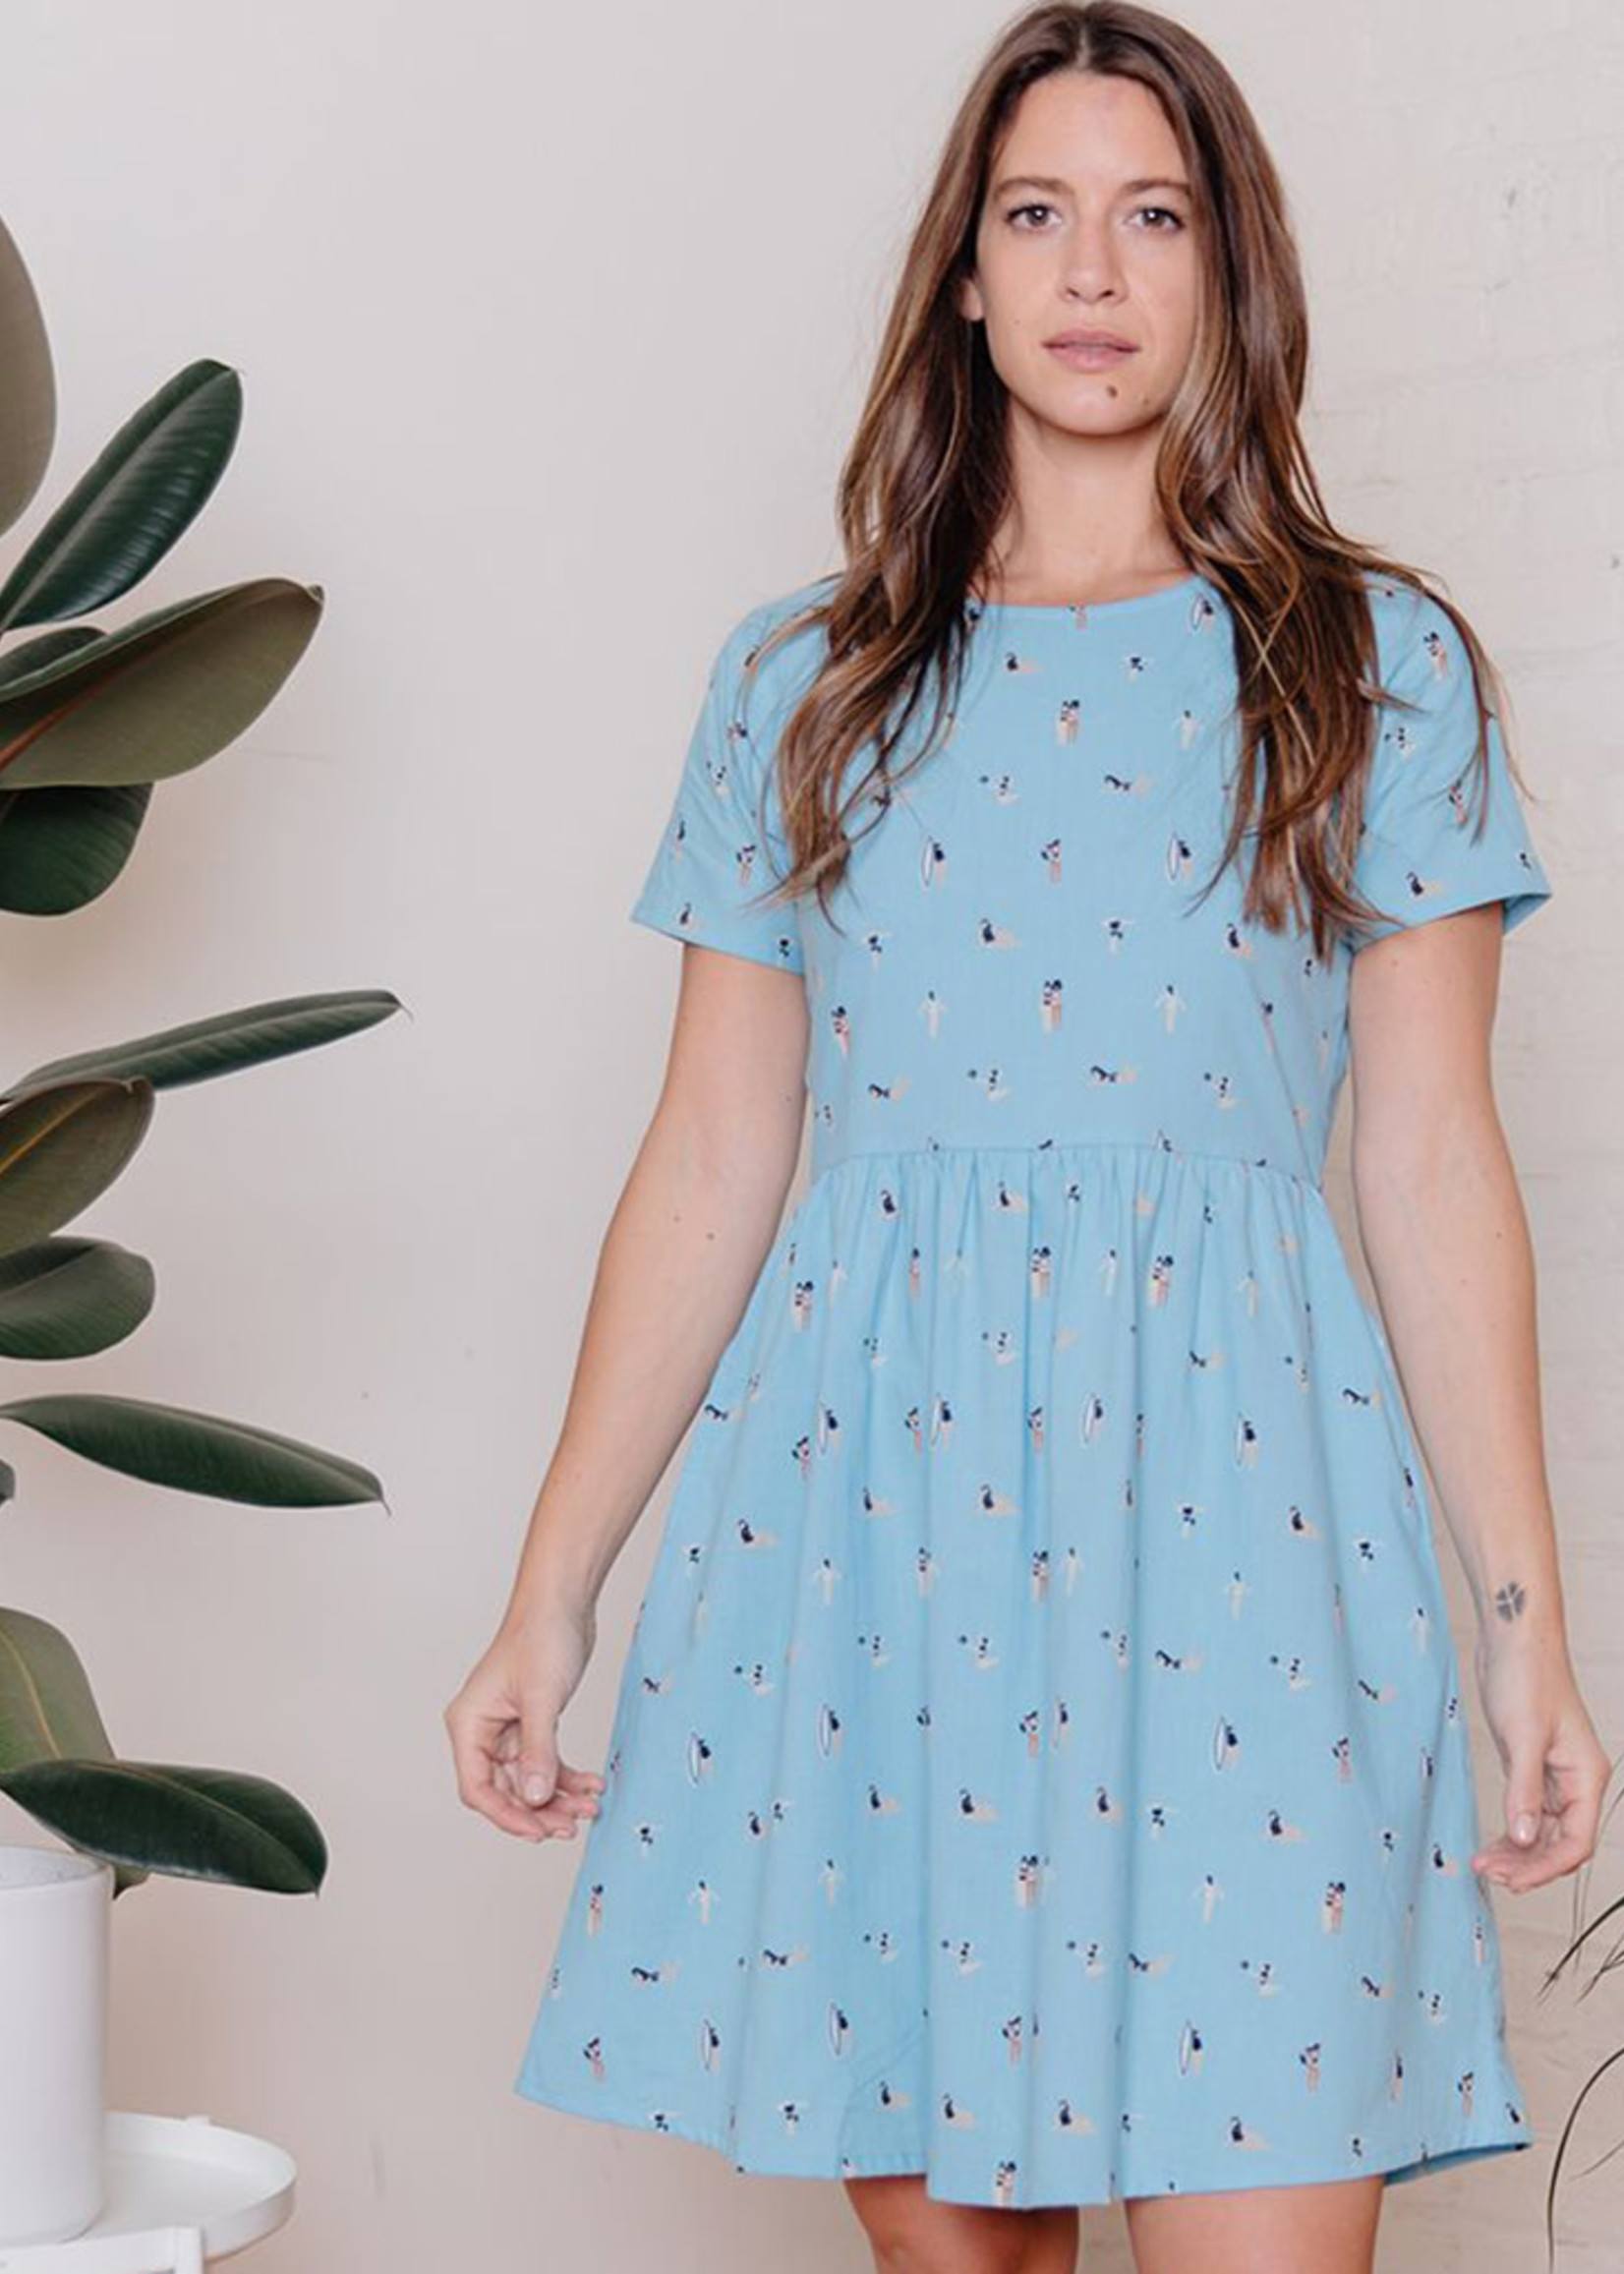 Mata Traders Serenade Blue Swimmers Dress